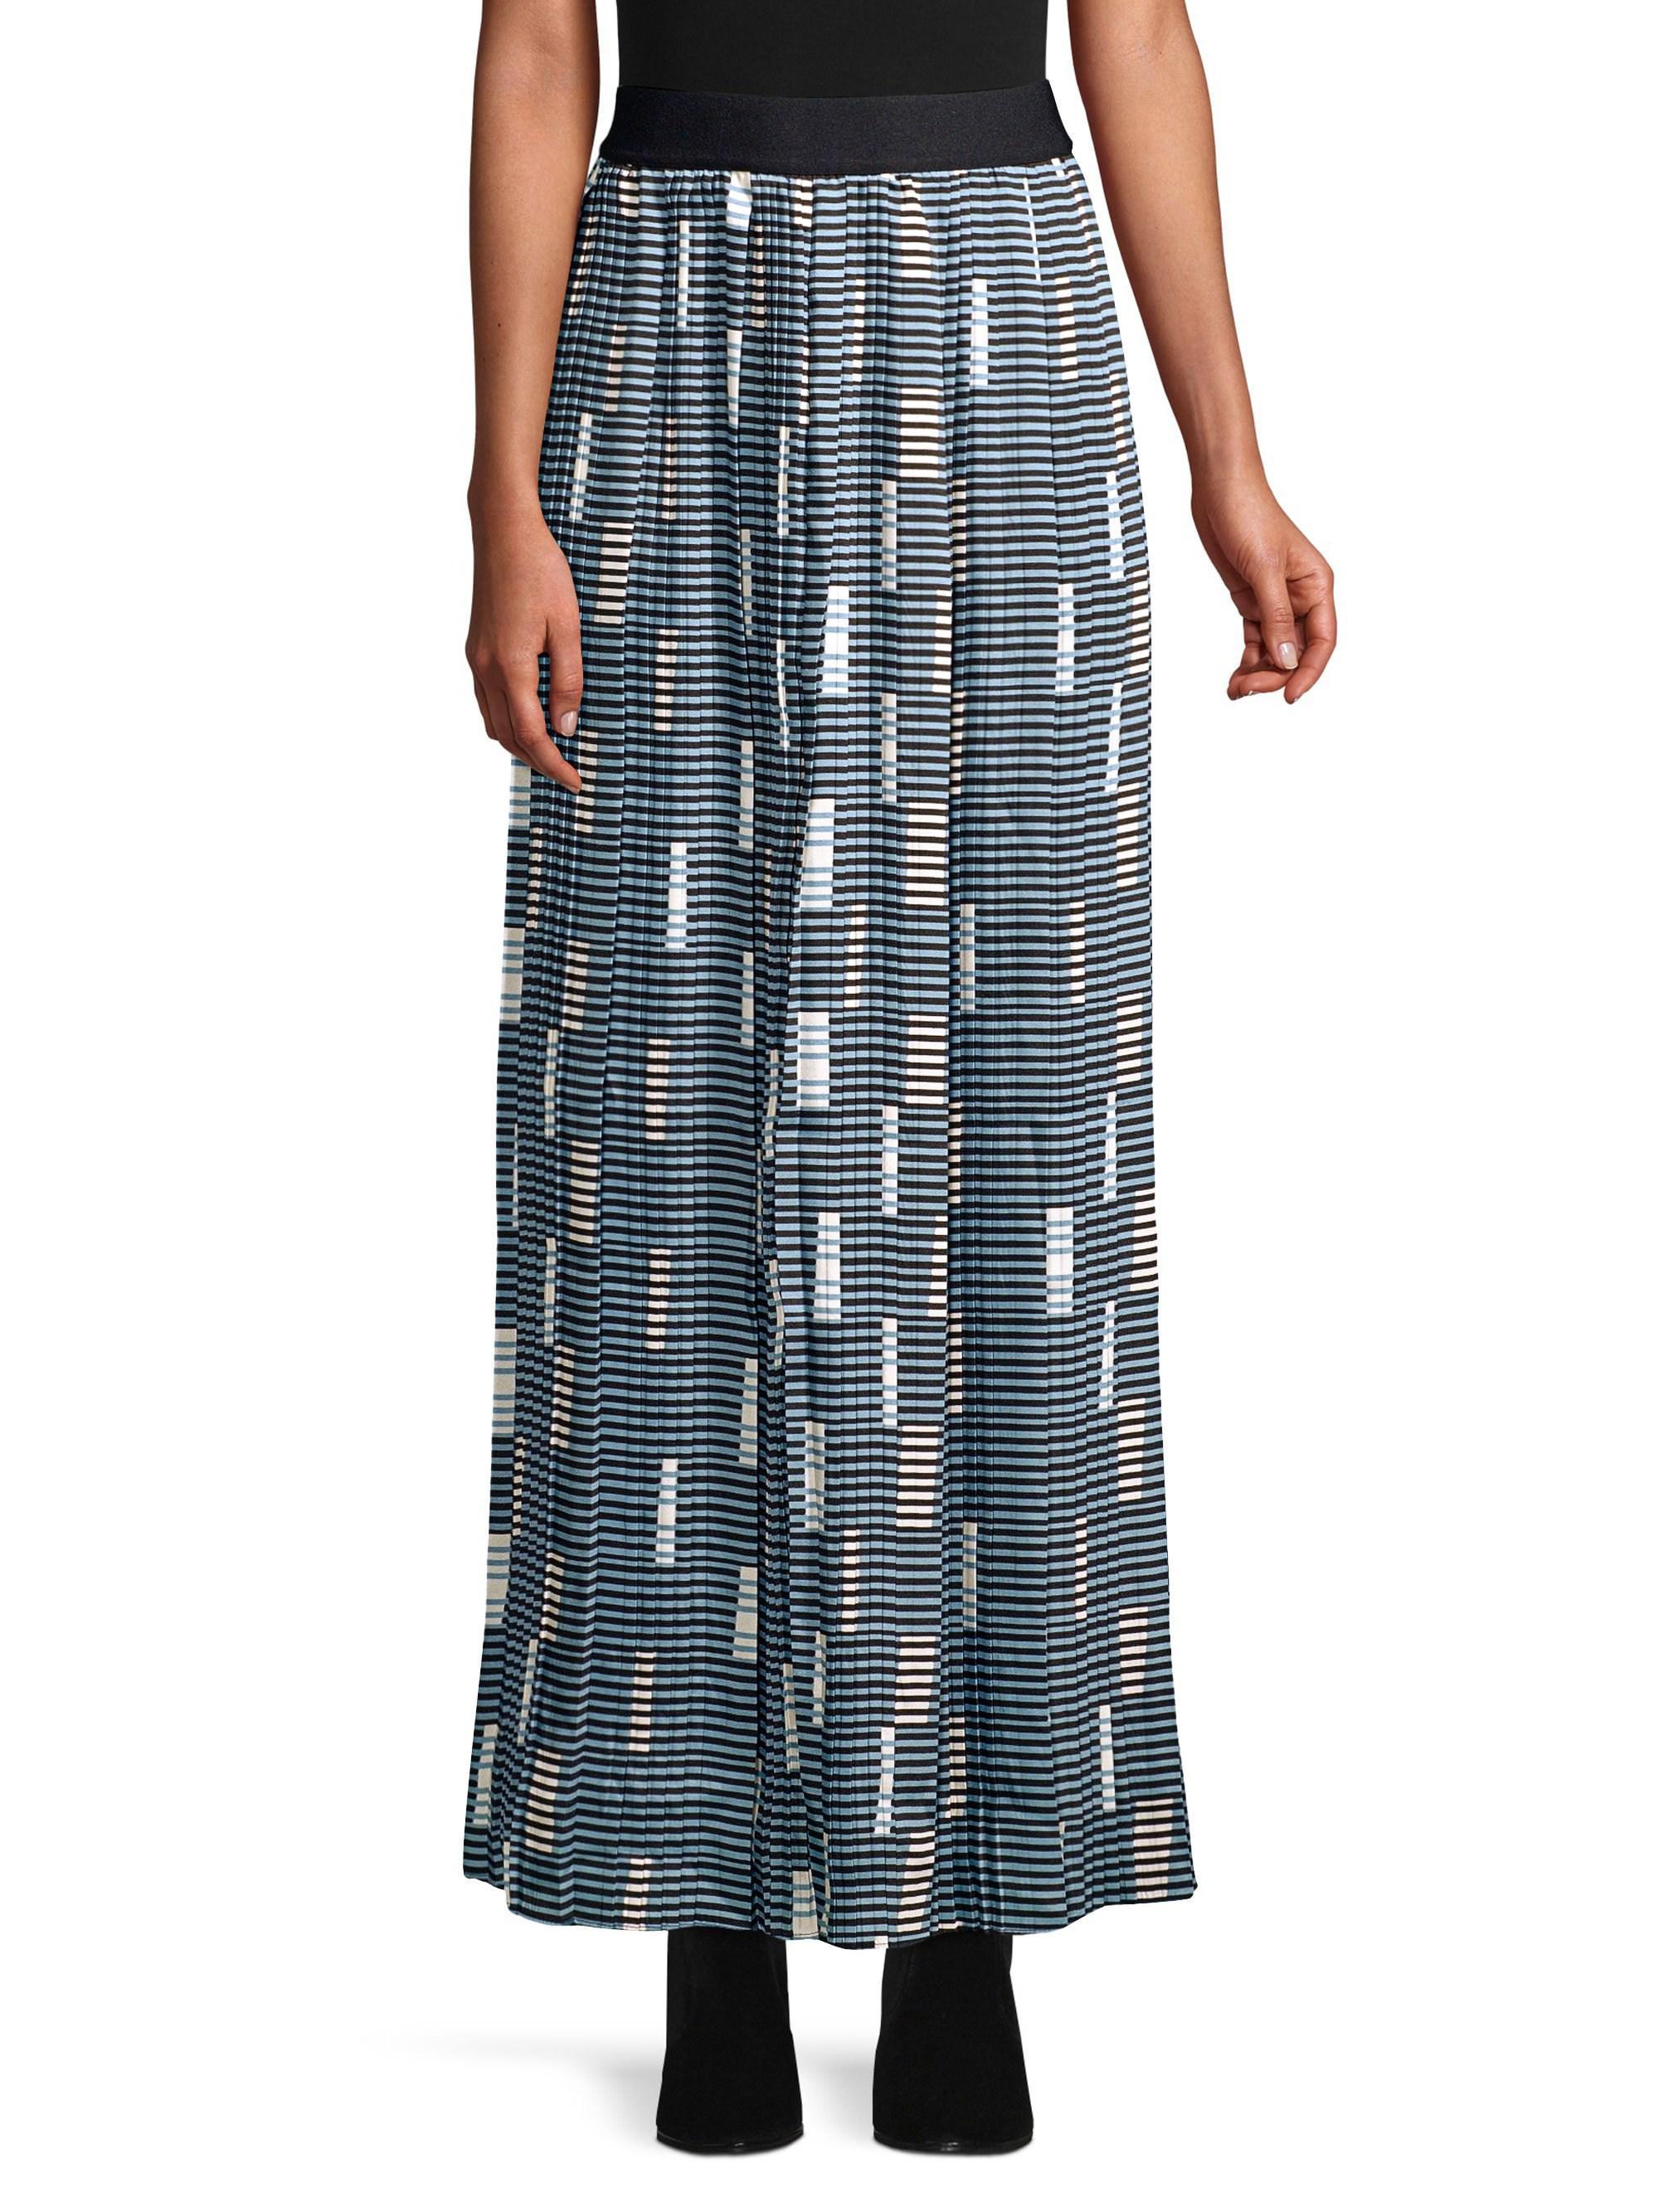 a200fba137e8 beatrice-b-azzurro-blue-Graphic-Print-Pleated-Maxi-Skirt.jpeg